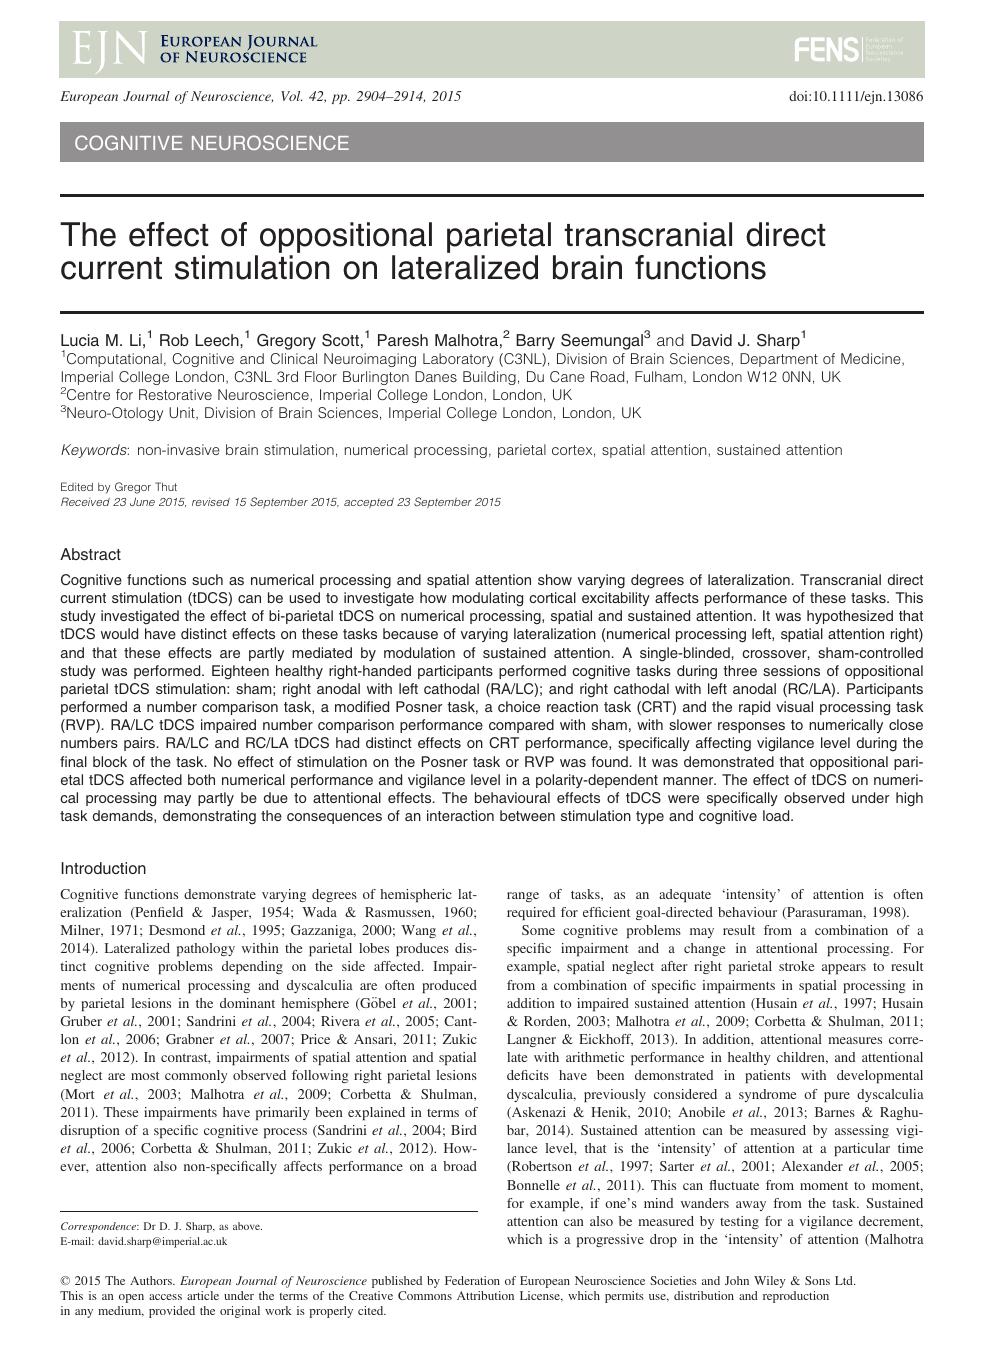 The effect of oppositional parietal transcranial direct